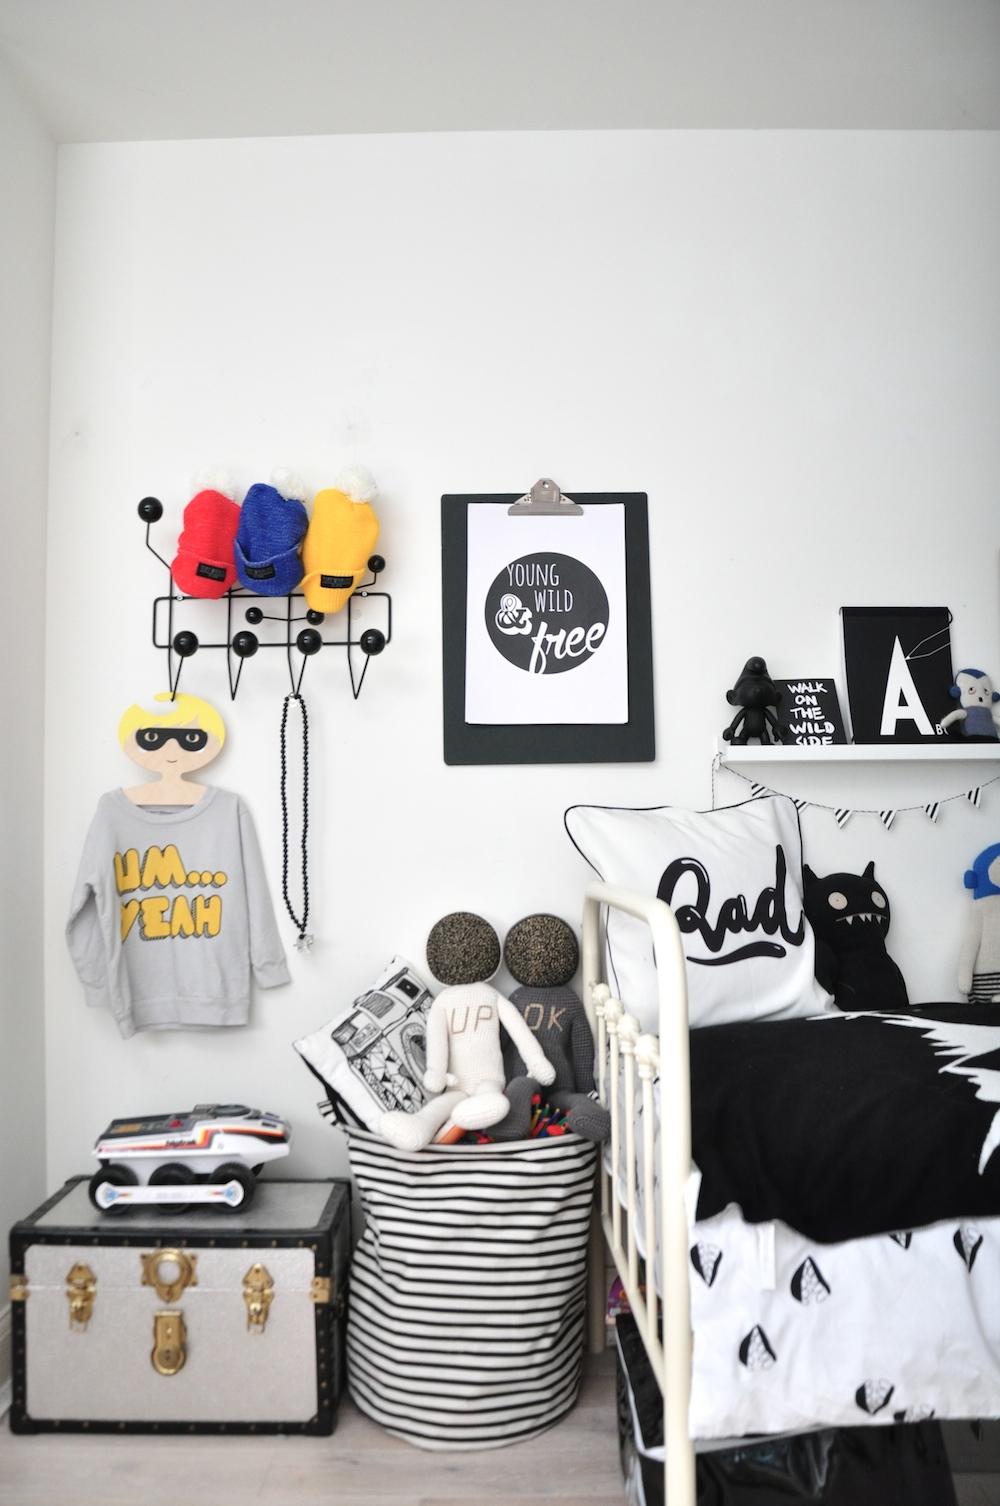 Mesh_board_studio_nl_tiny_whales_hat